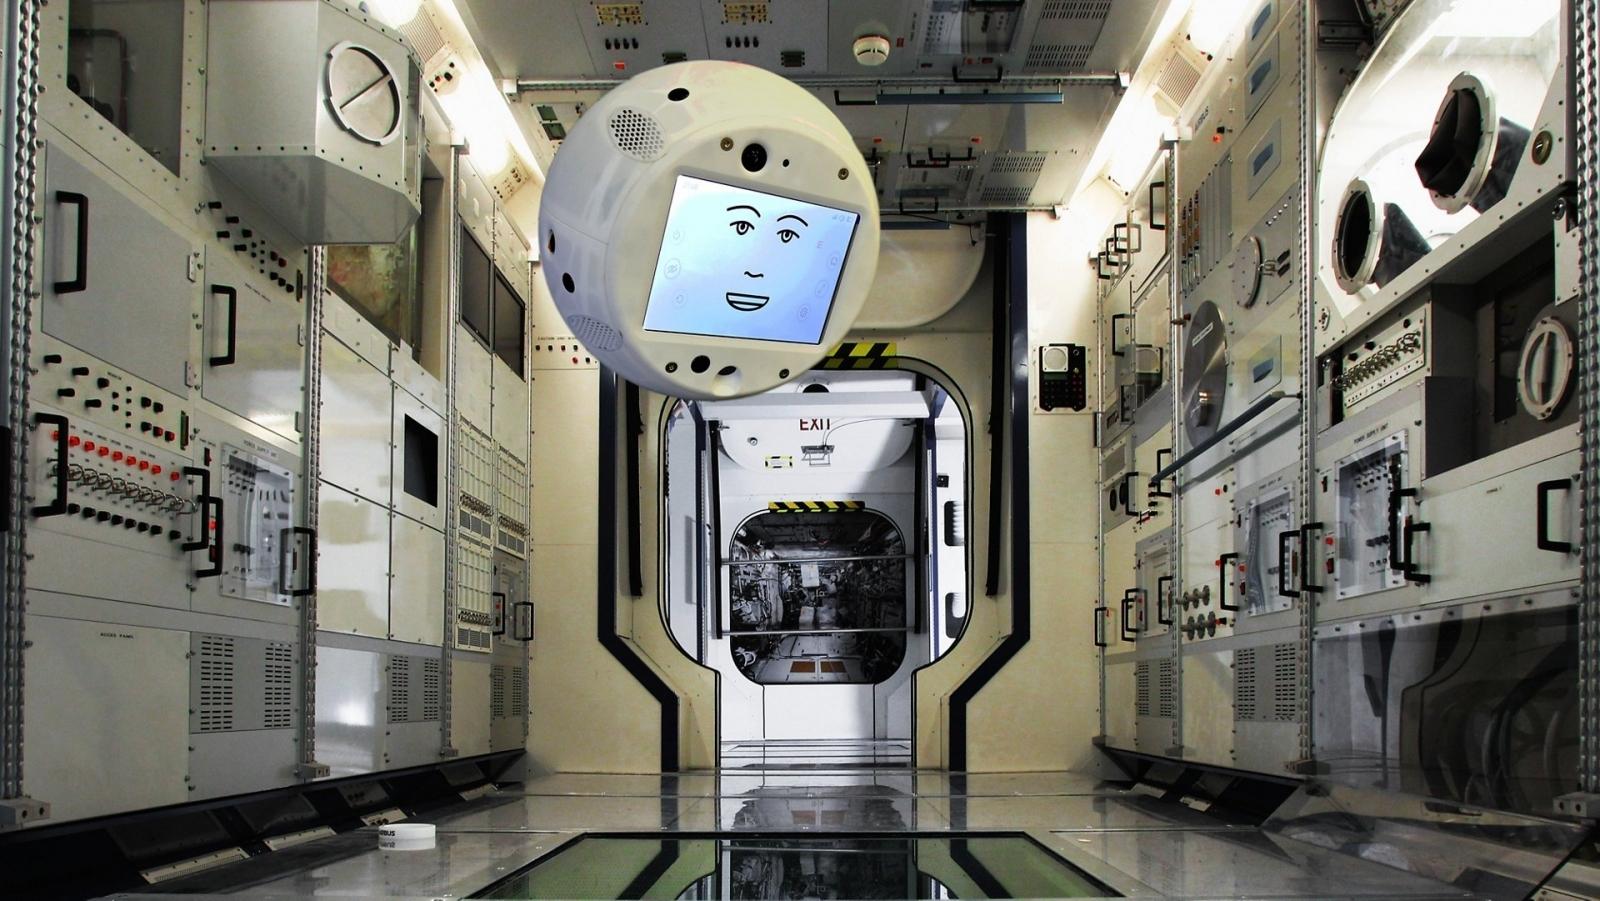 Airbus/IBM venture designing first AI assistant for astronauts